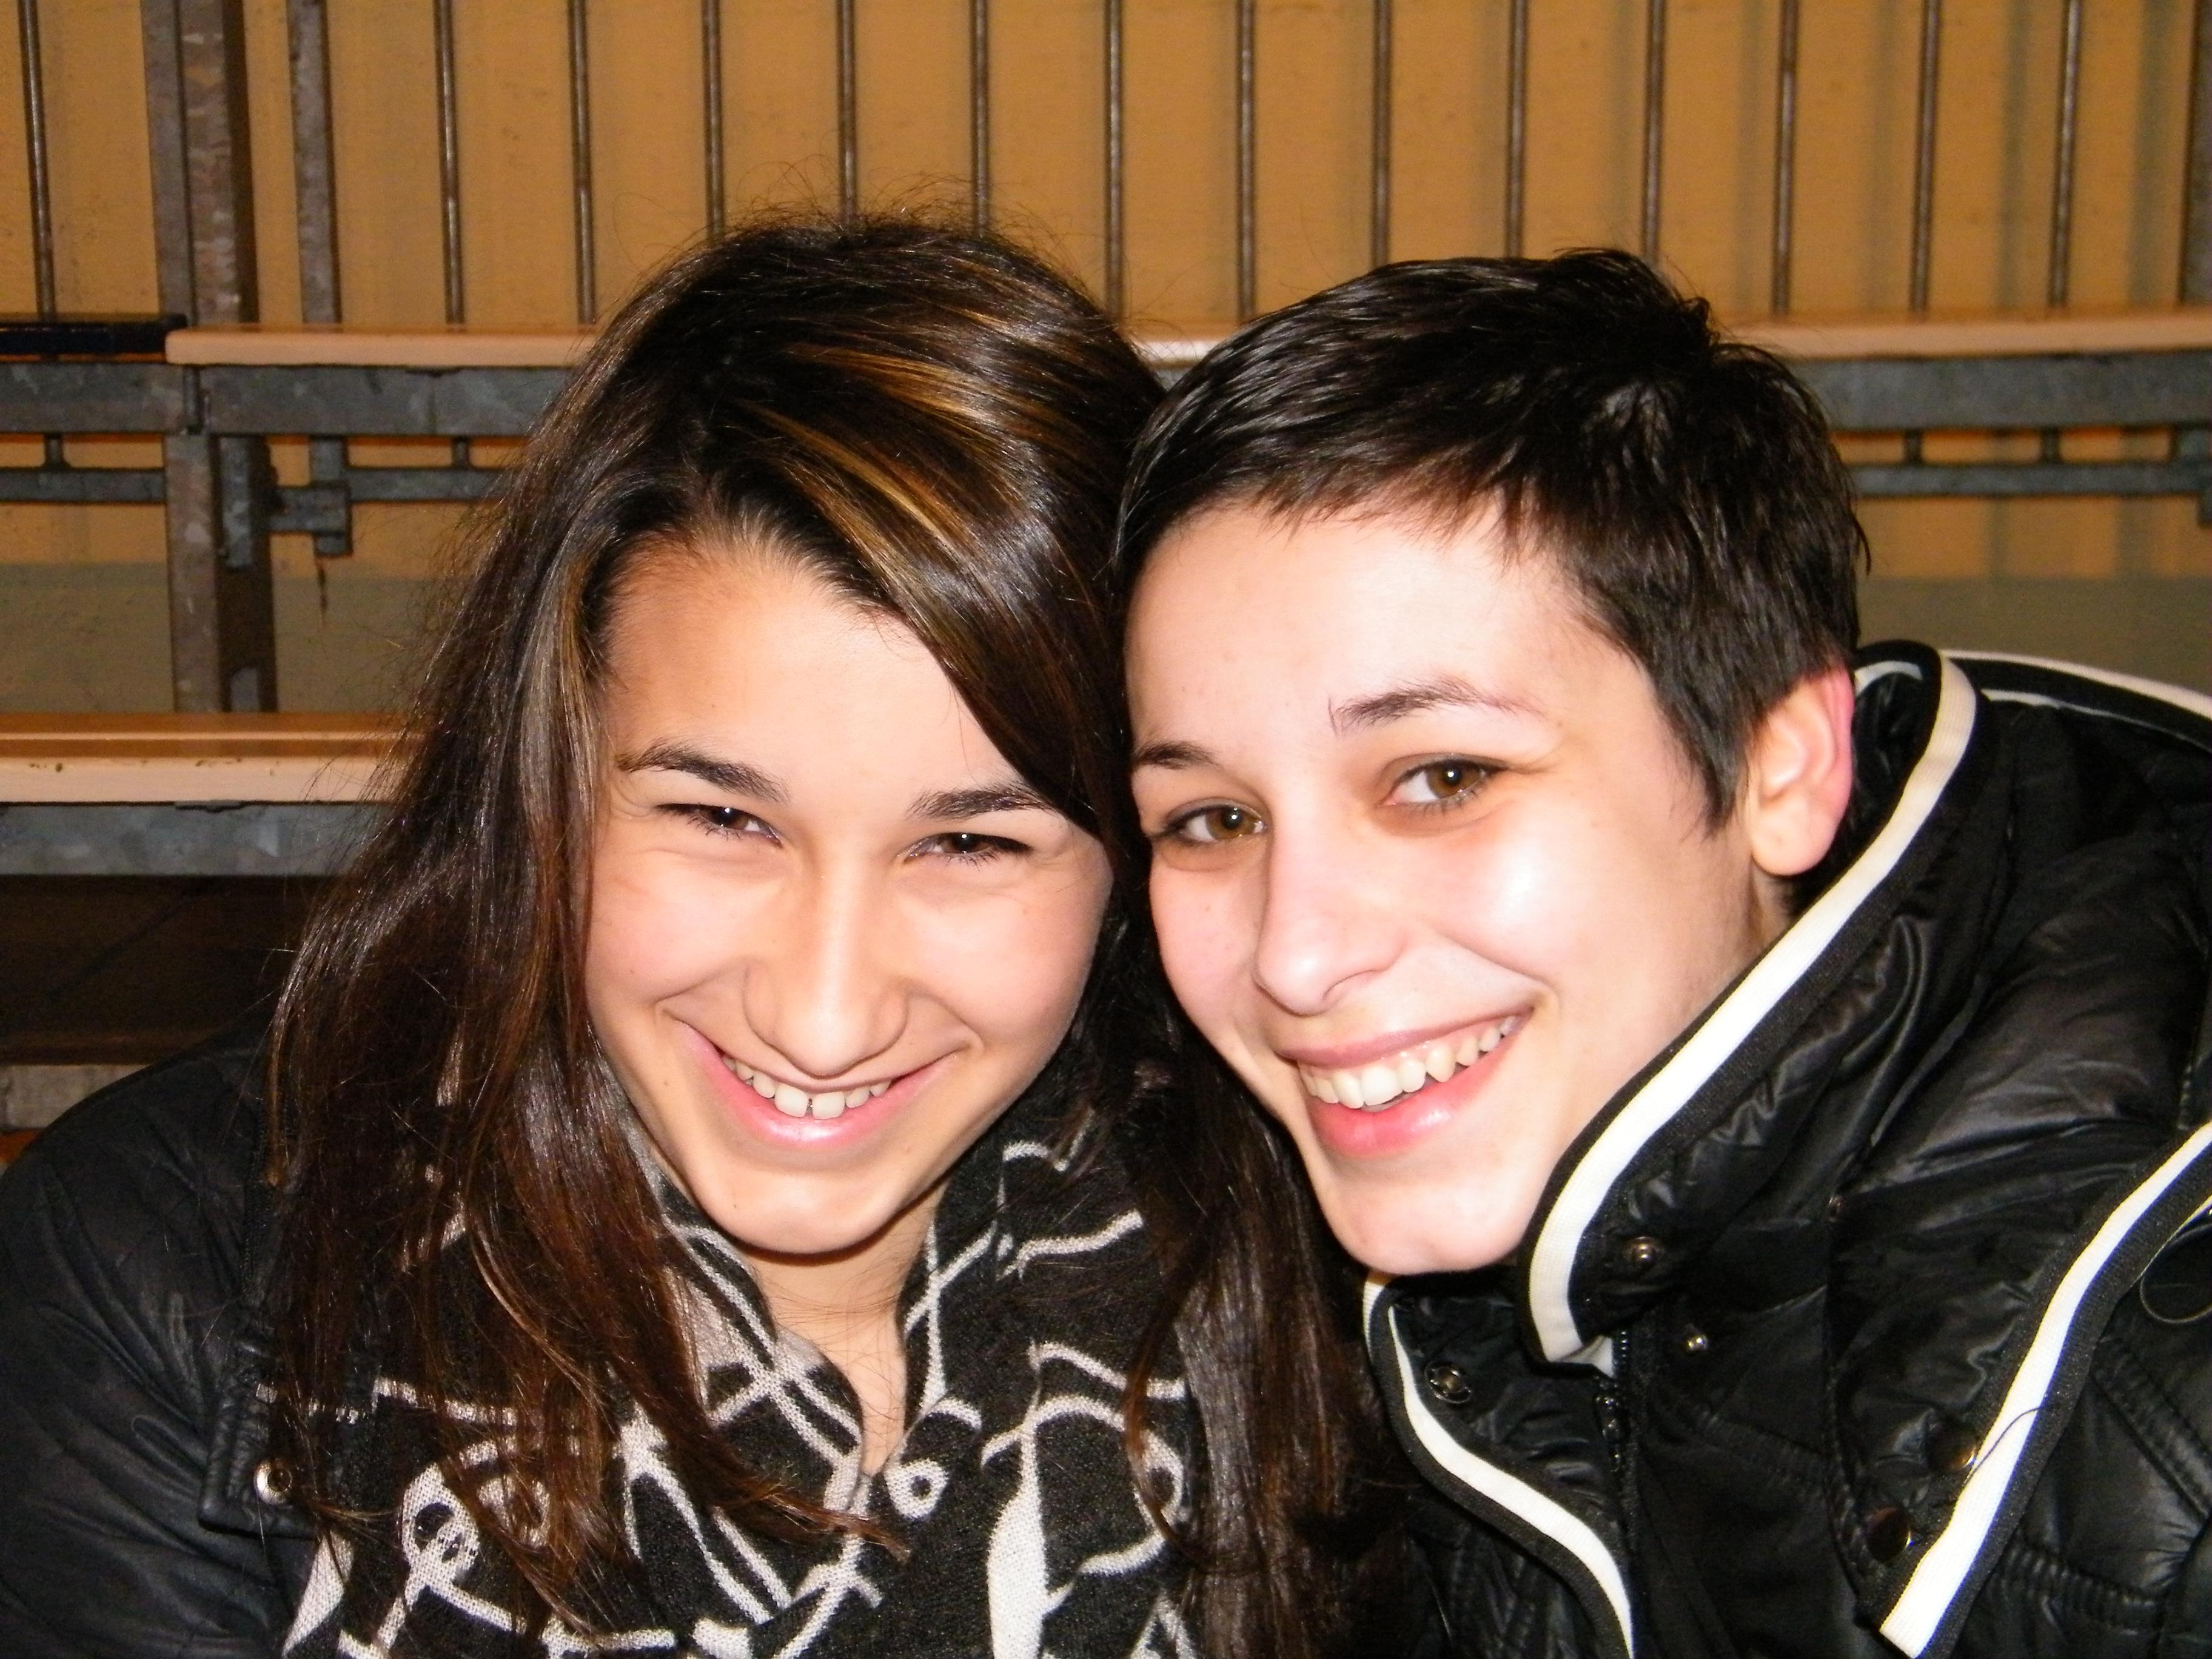 Les soeurs Bergey2